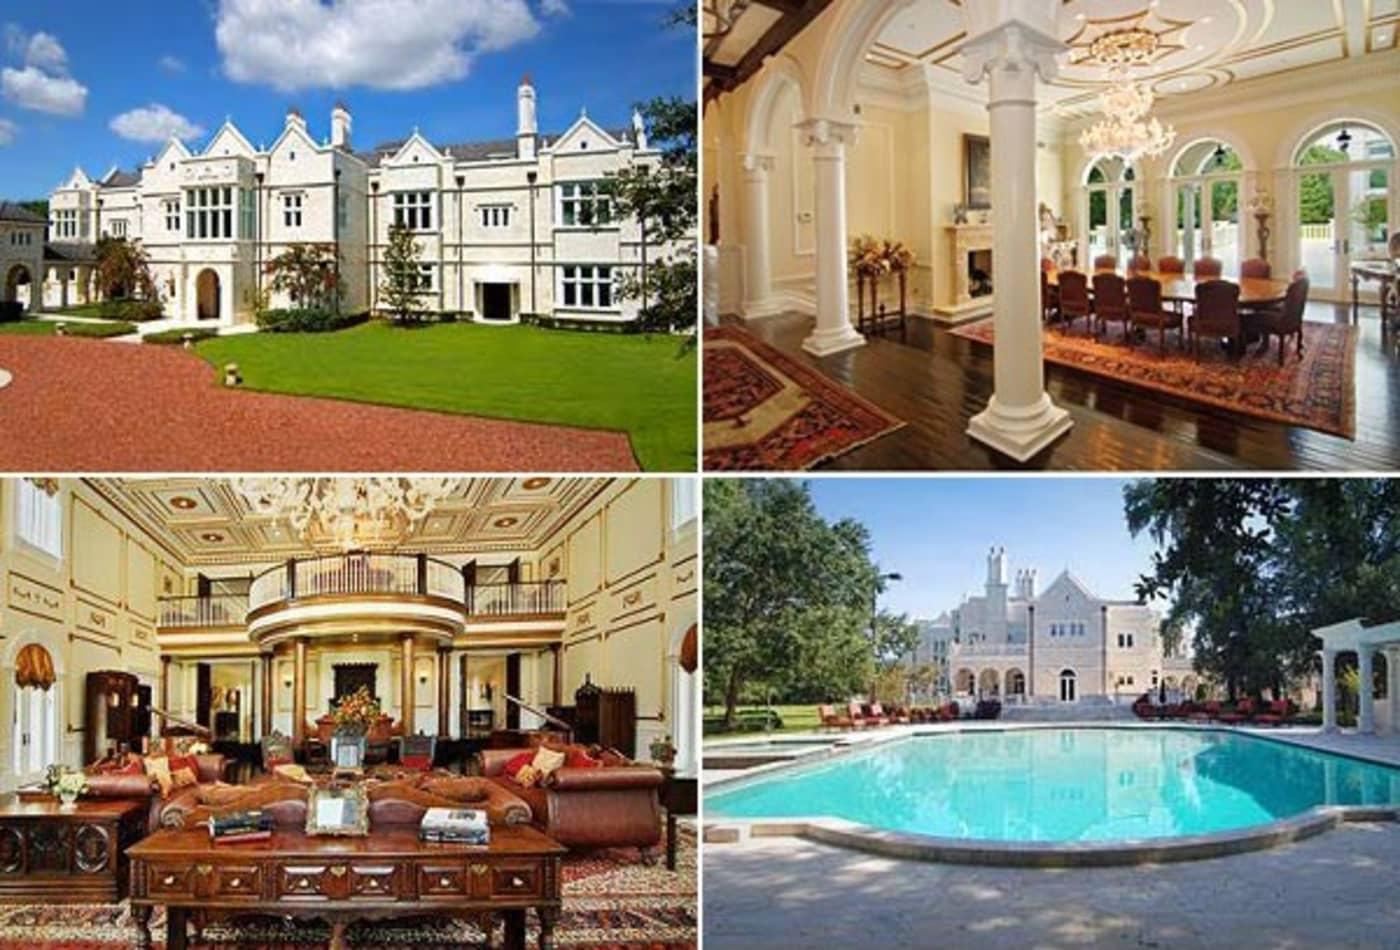 British-Palace-Tampa-Florida-Golf-Homes-CNBC.jpg